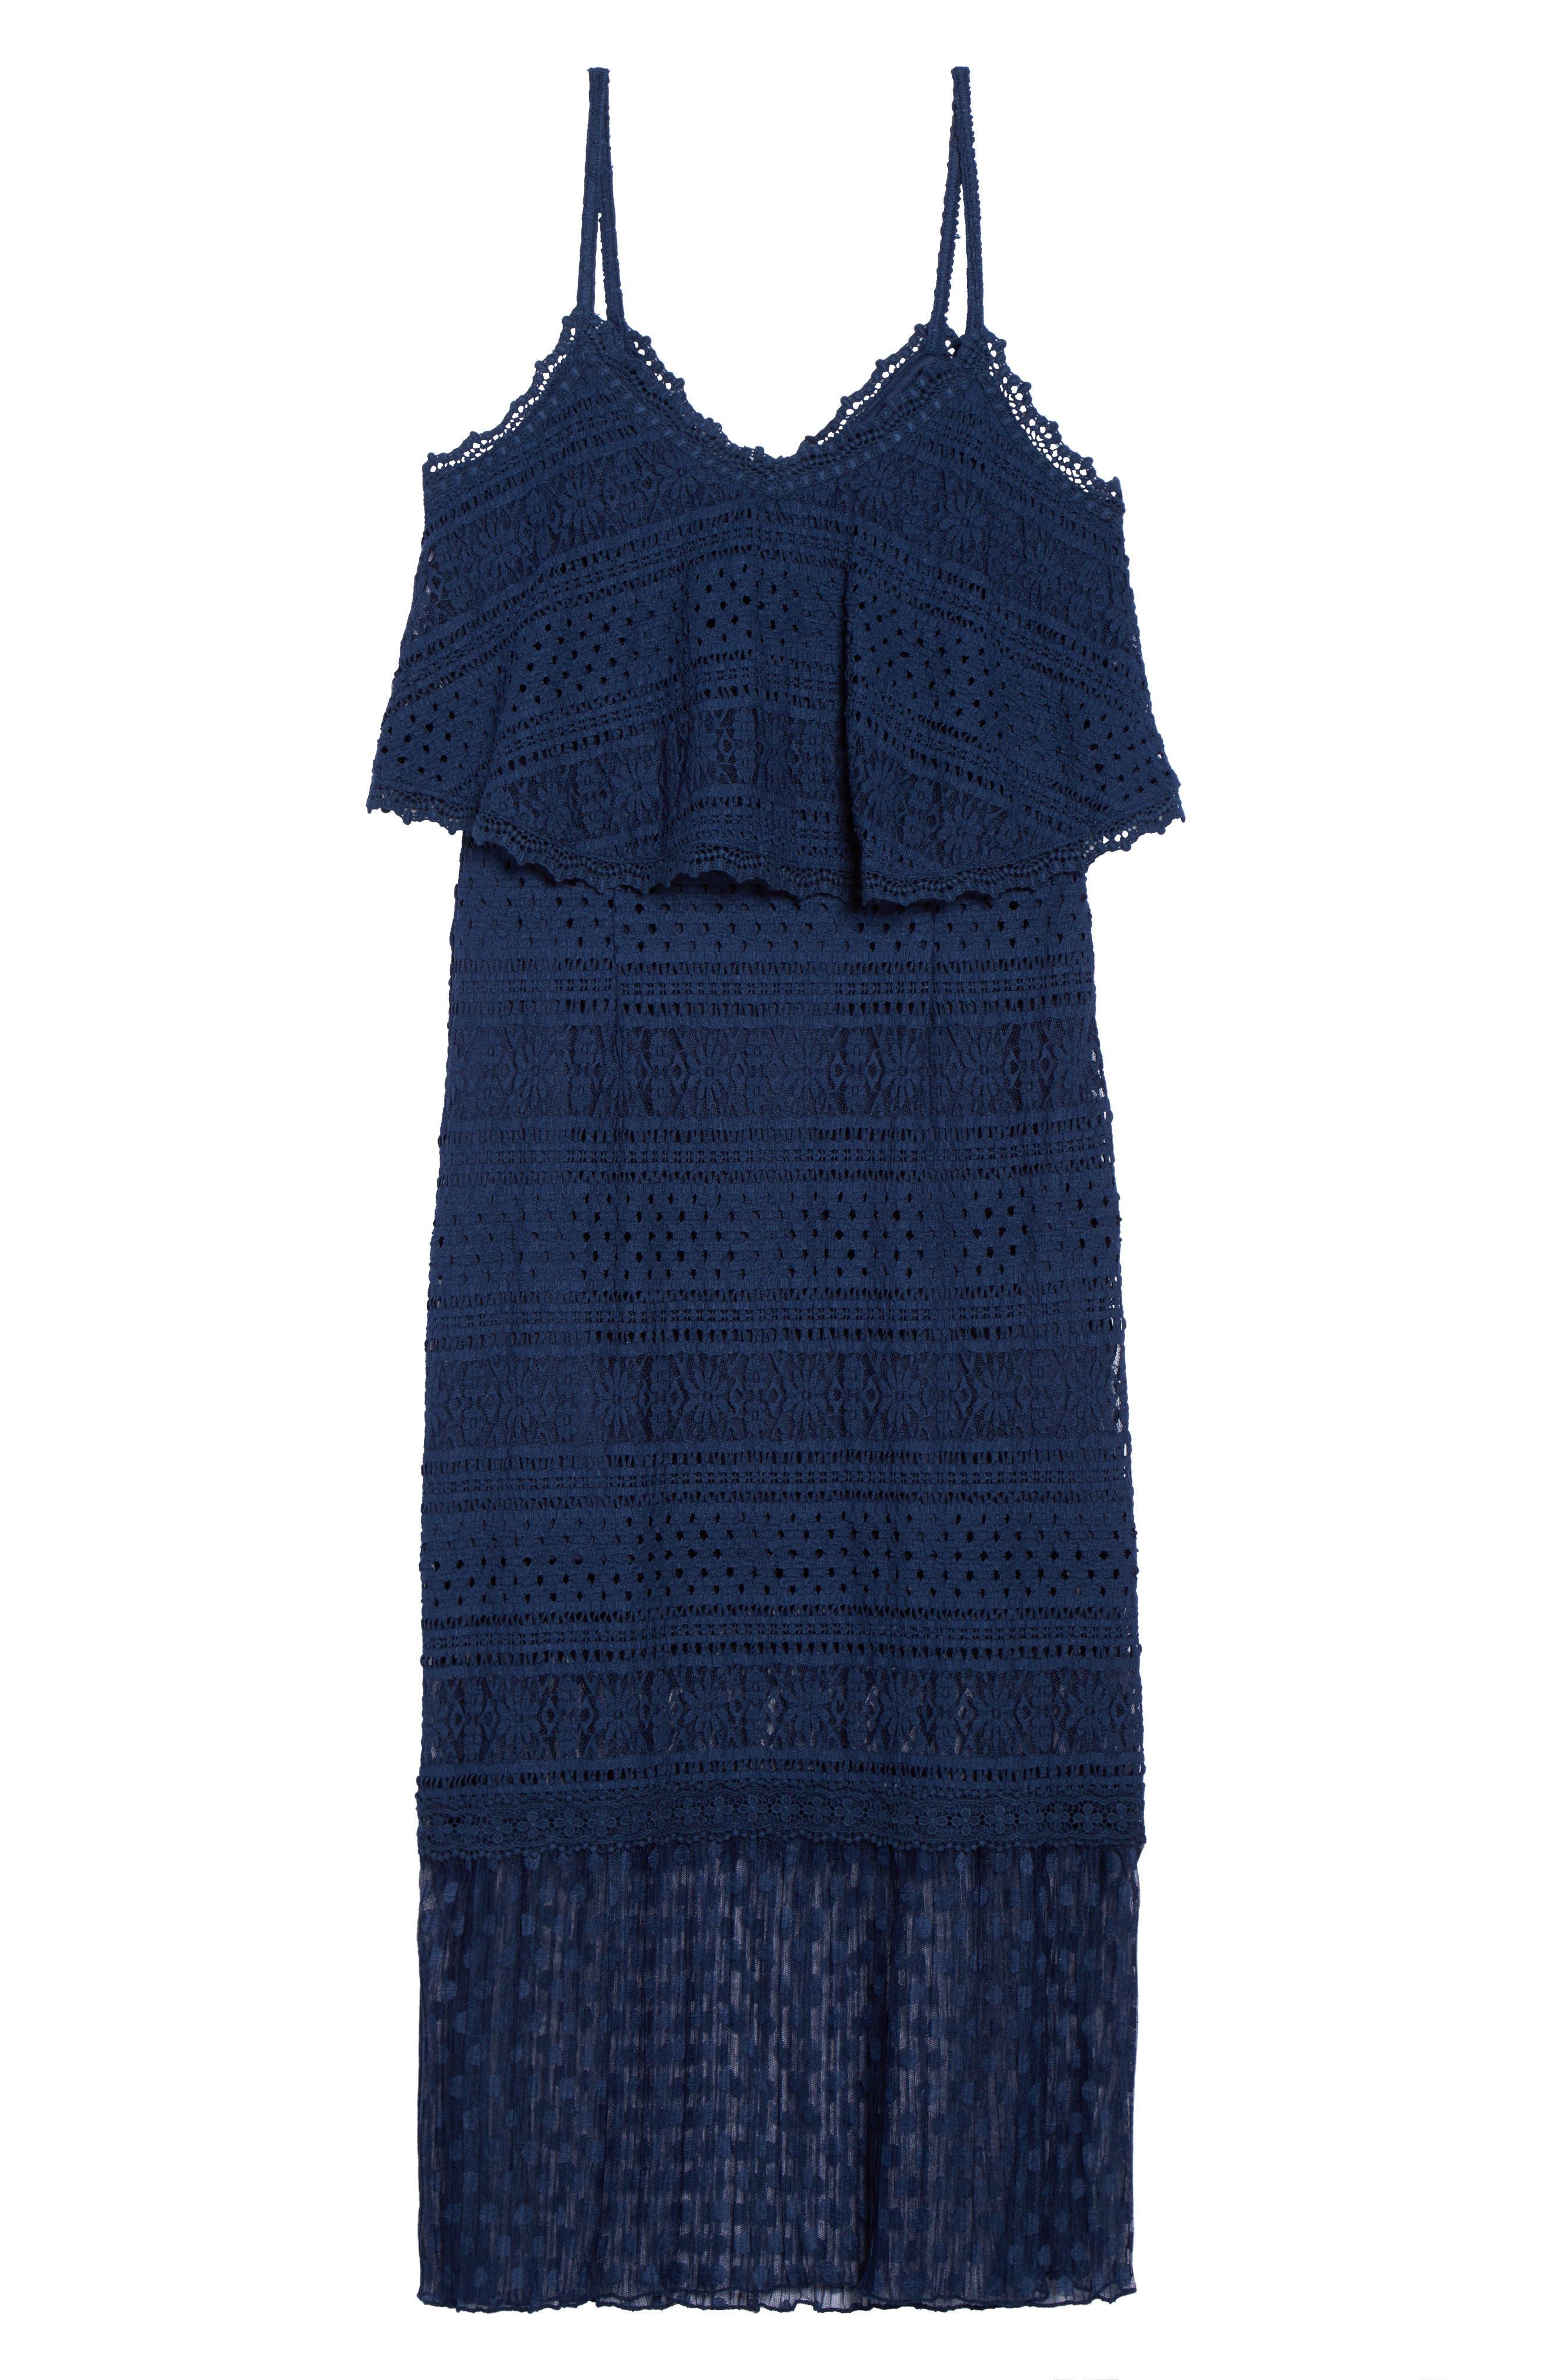 Ellie Lace Midi Dress,                             Alternate thumbnail 6, color,                             414